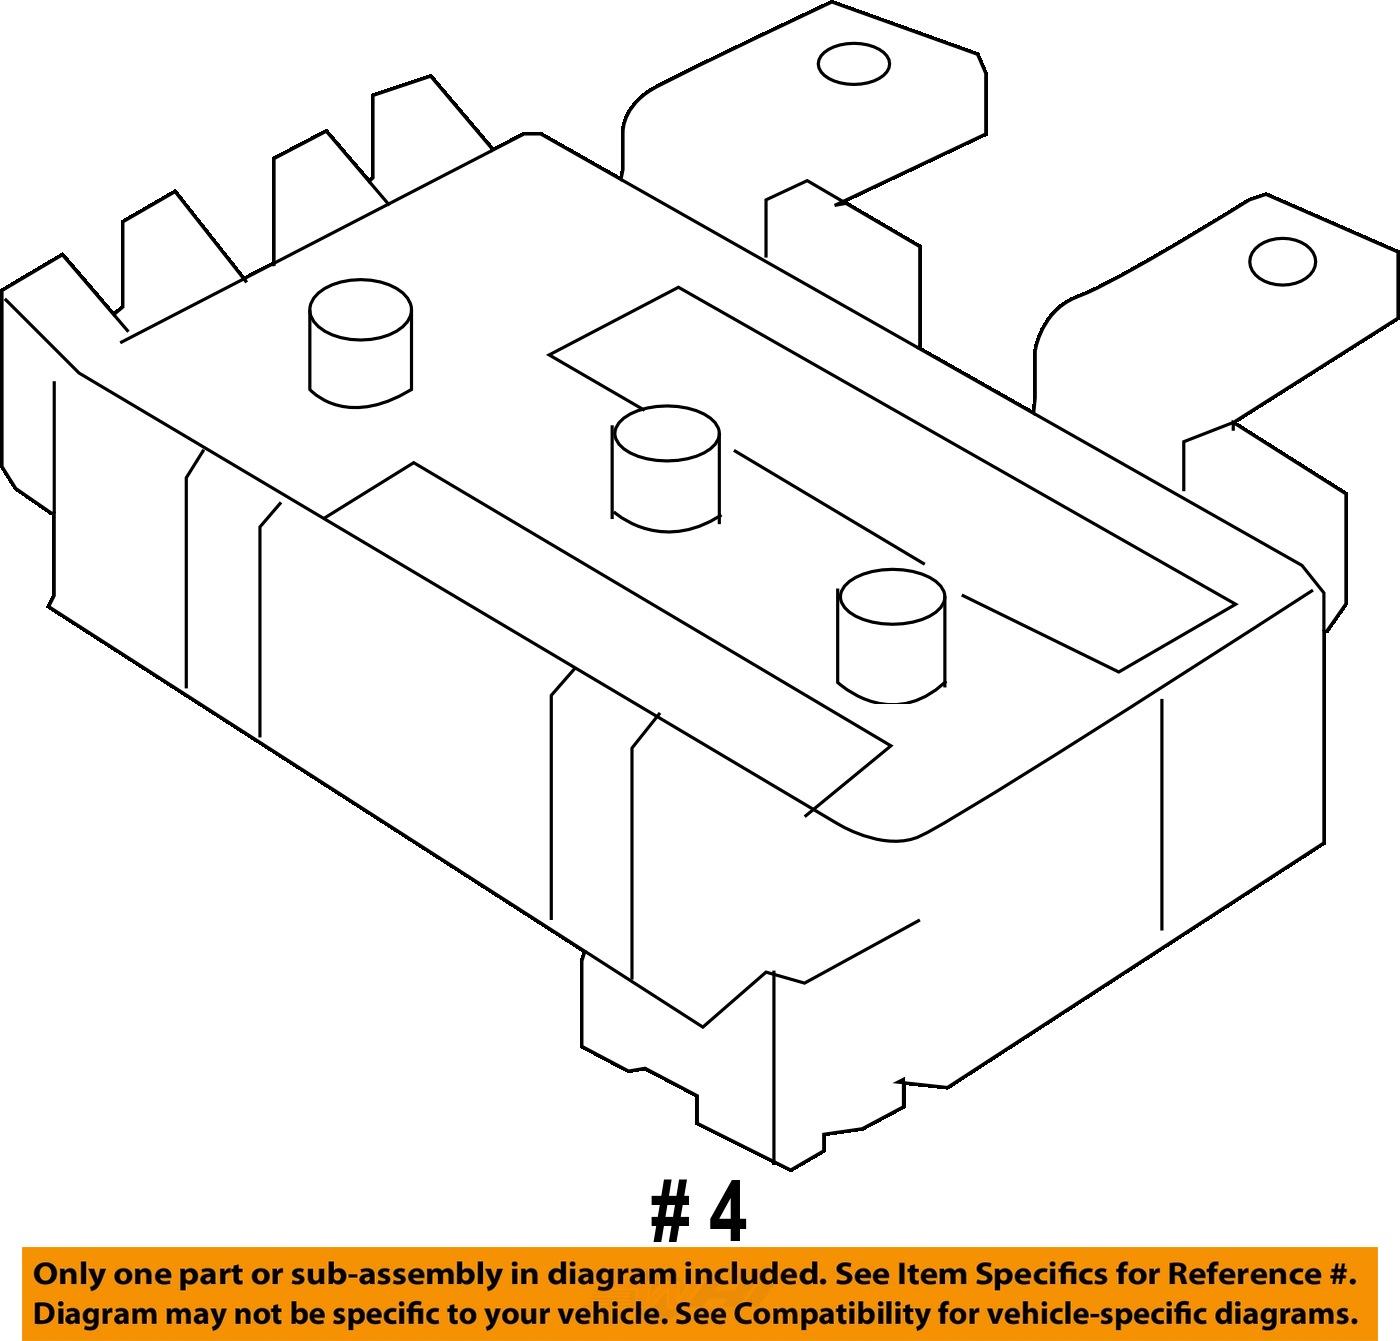 hight resolution of 2008 hyundai azera fuse box diagram 2008 mercury grand 2006 hyundai azera wiring diagram 2006 hyundai